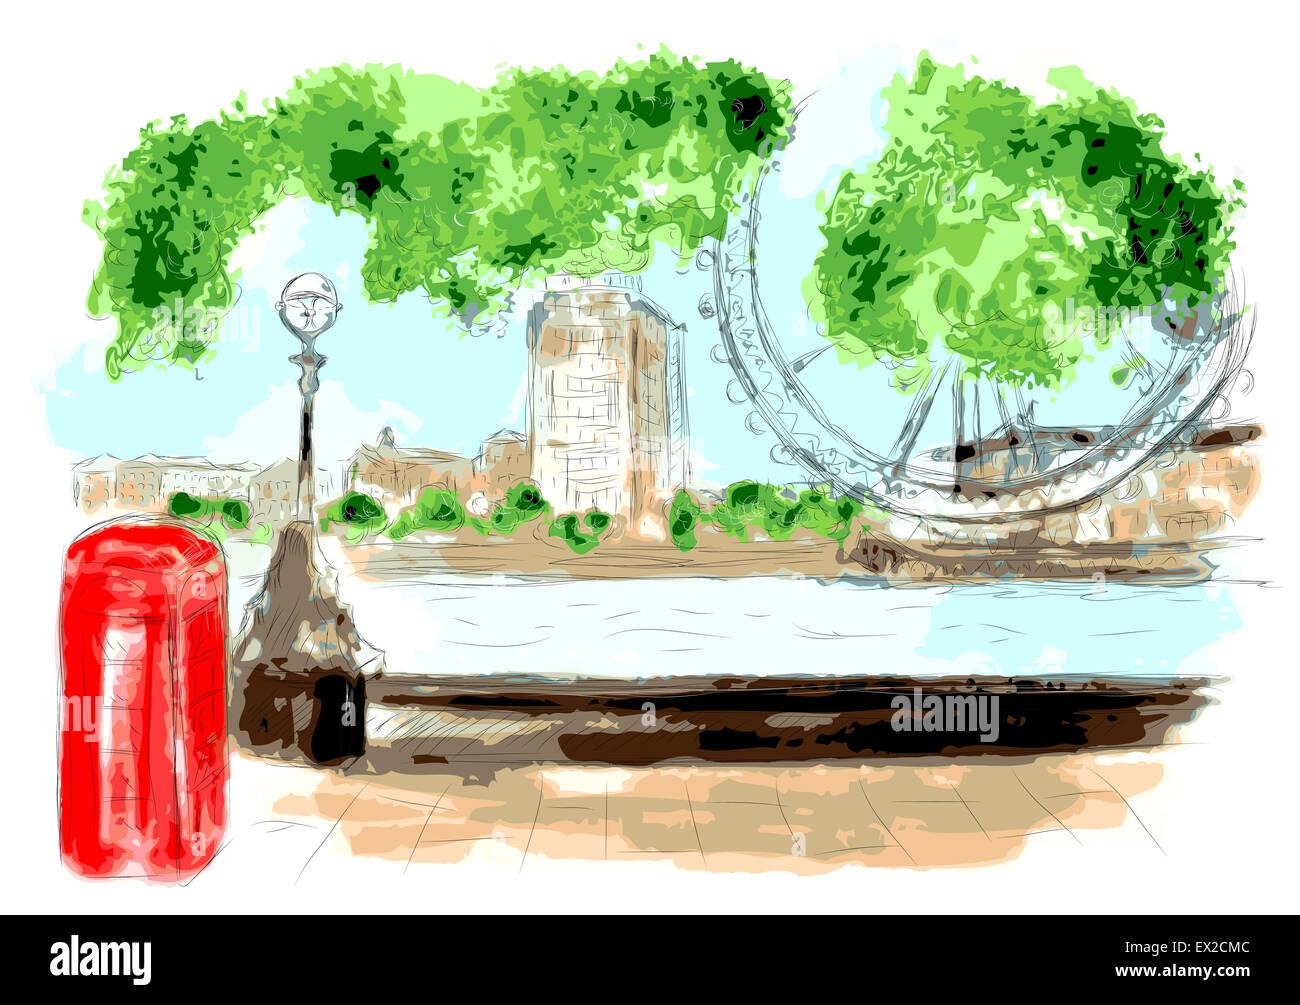 london river - Stock Image